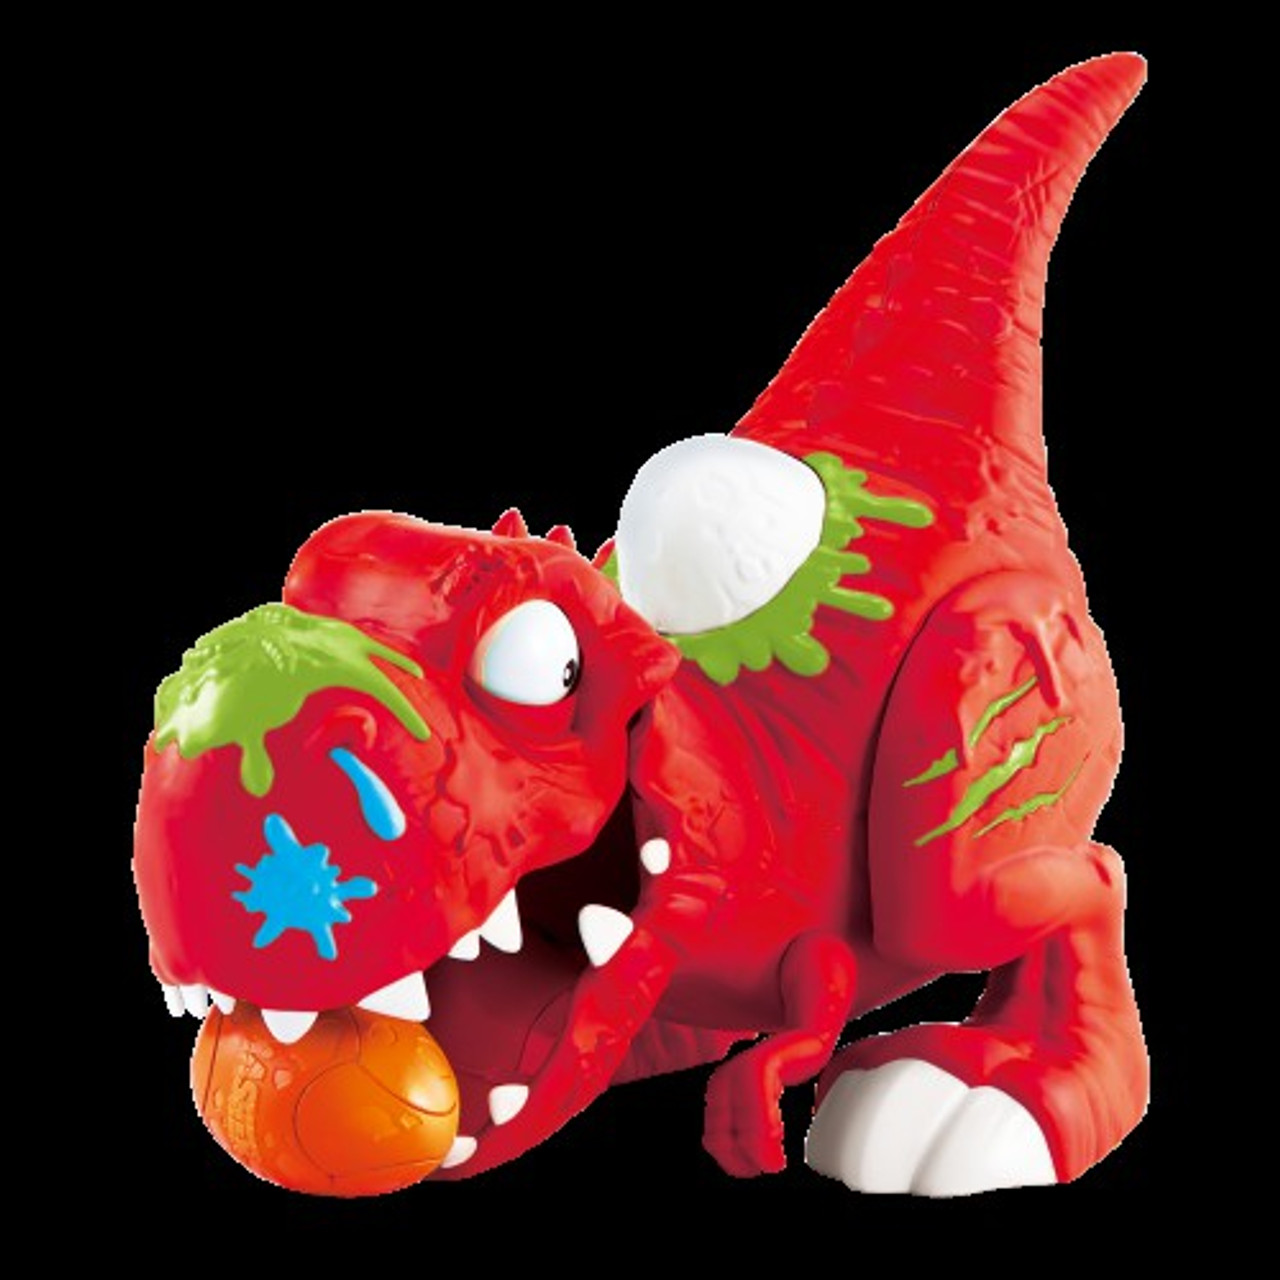 Smashers Series 3 Dino Smash Rex Playset Zuru Toys - ToyWiz